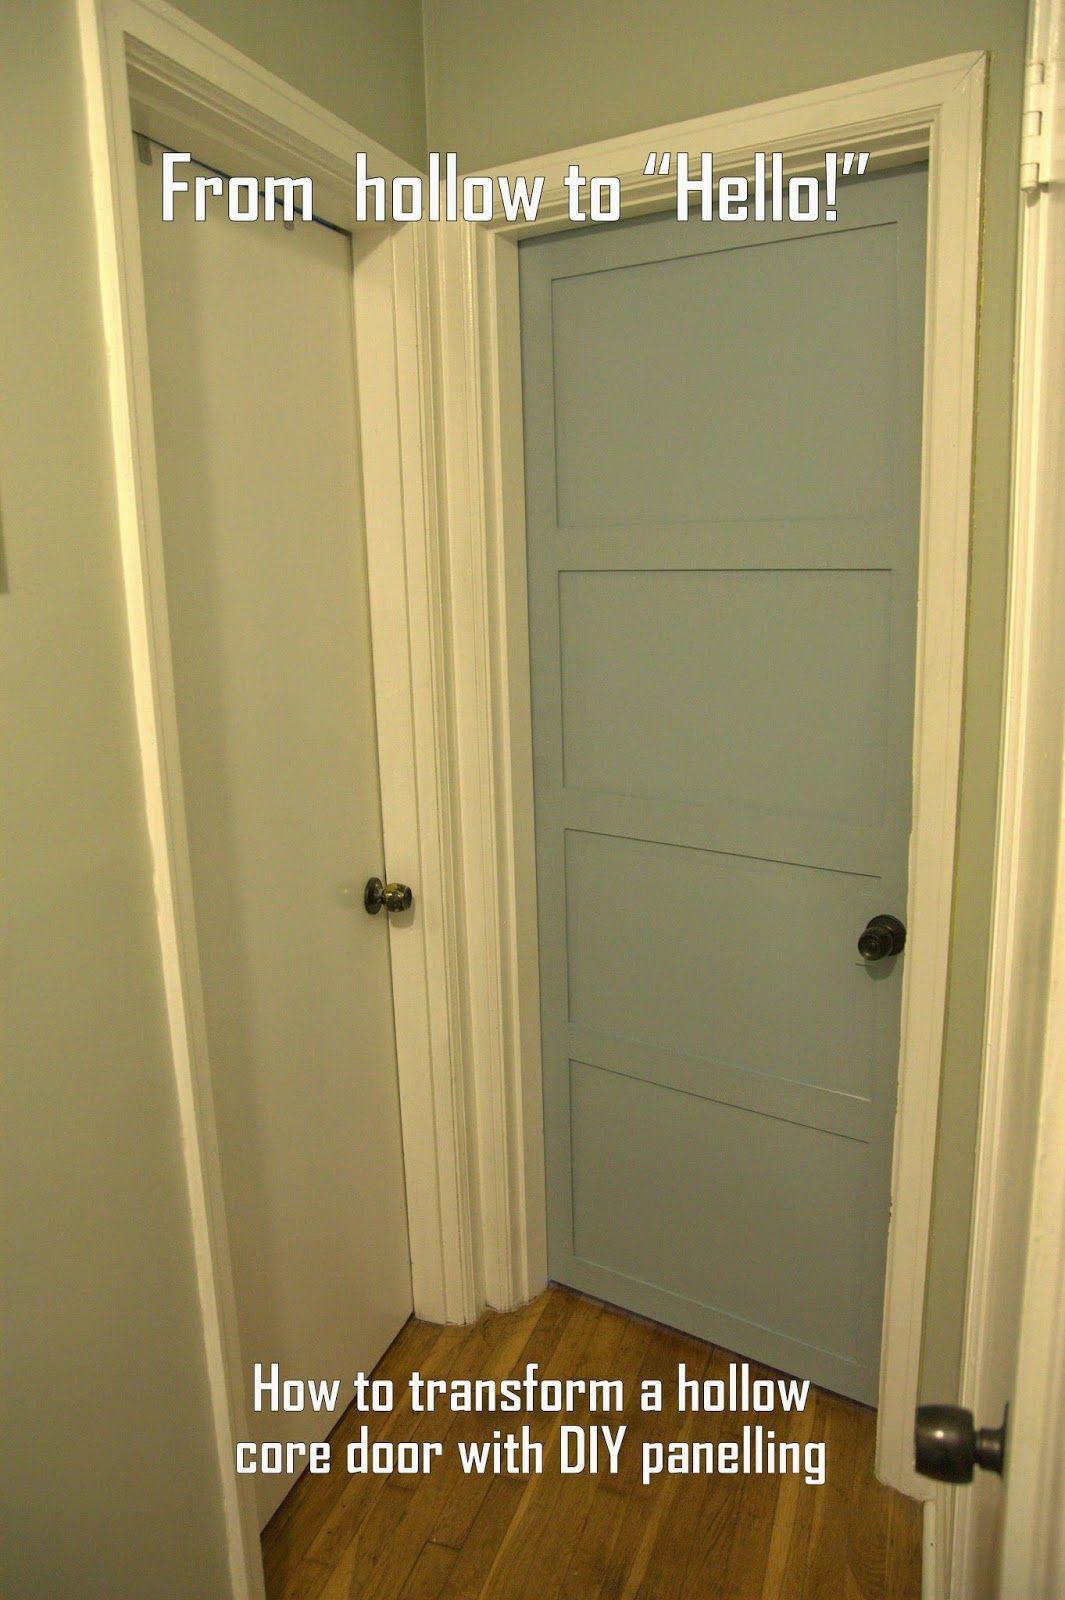 House Blogs diy hollow core doors to doors with trim: my old kentucky house